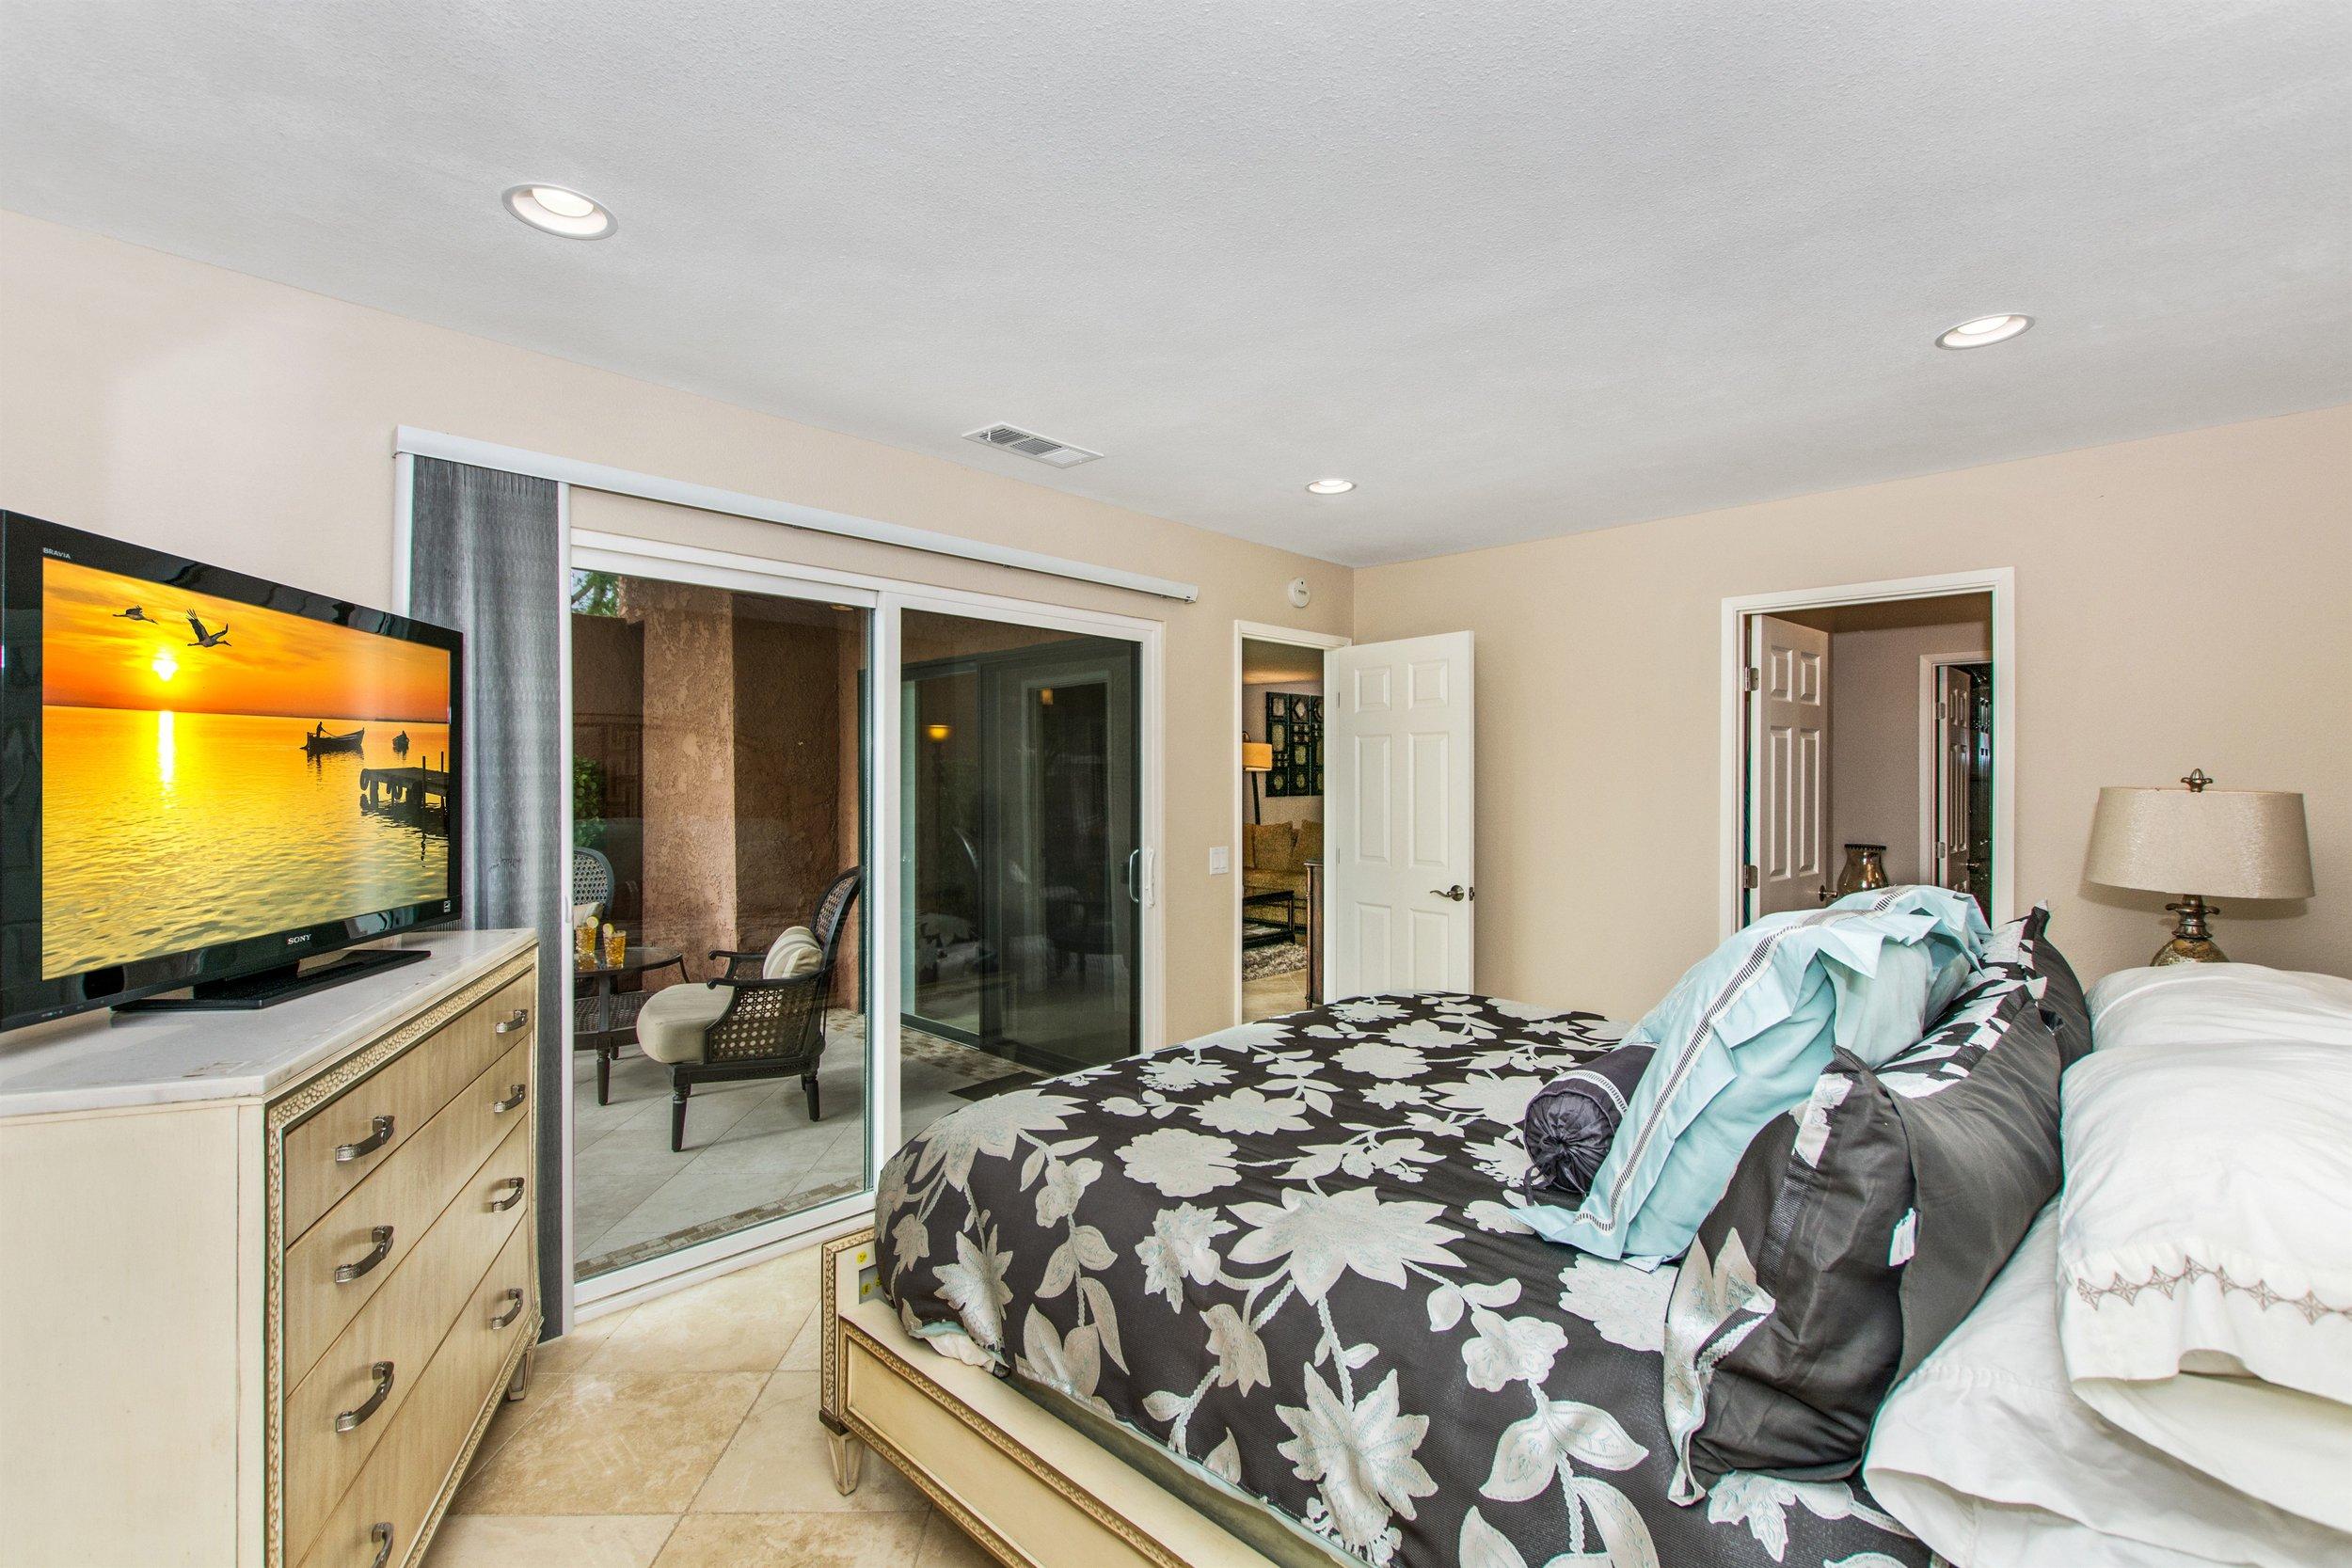 012_Bedroom 1.jpg